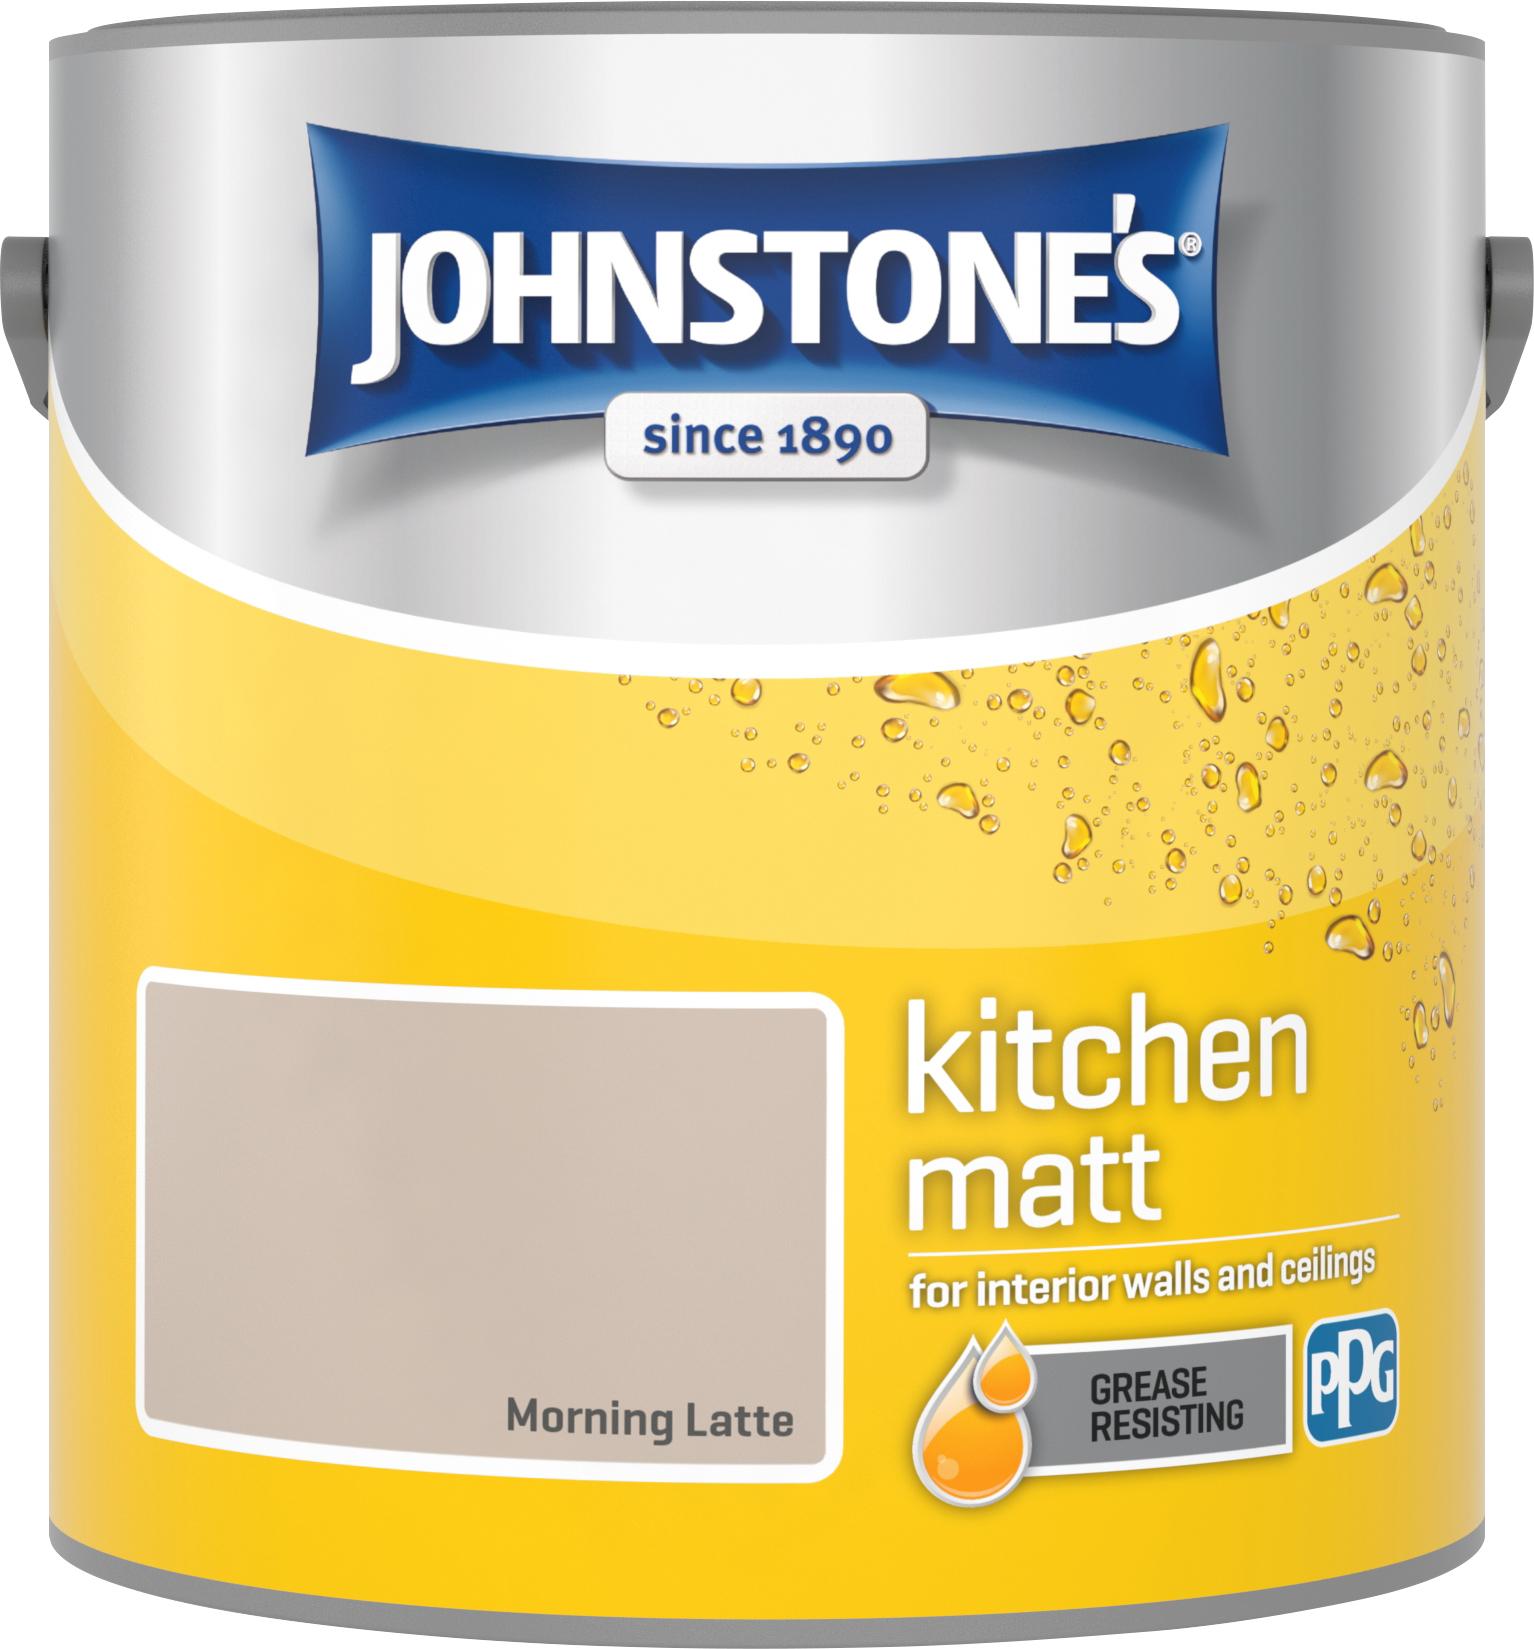 Johnstone's 2.5 Litre Kitchen Paint - Morning Latte